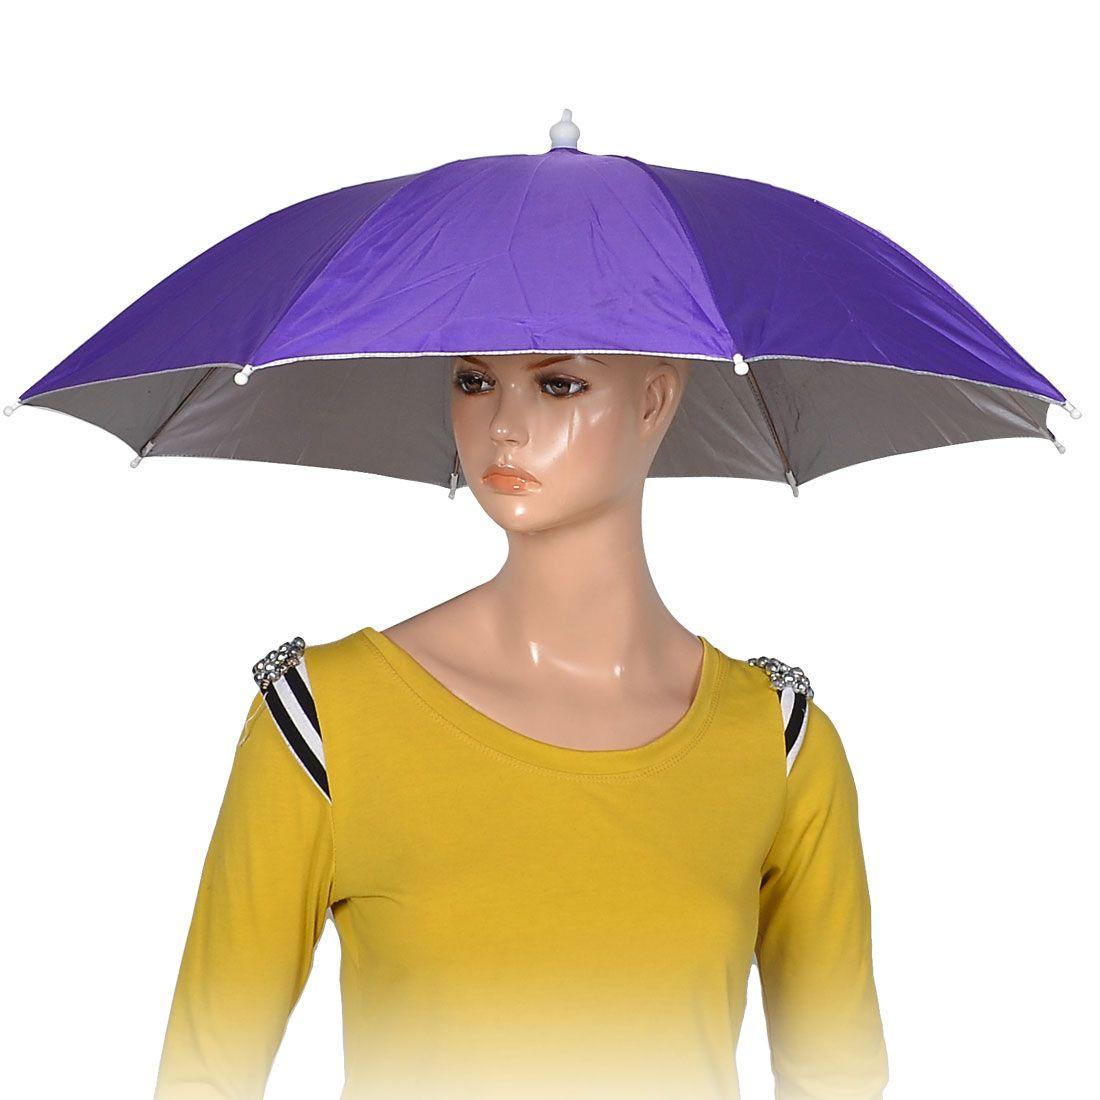 Purple Polyester 8 Ribs Fishing Sun Rain Headwear Umbrella Hat Cap ... ef99c9a0038a